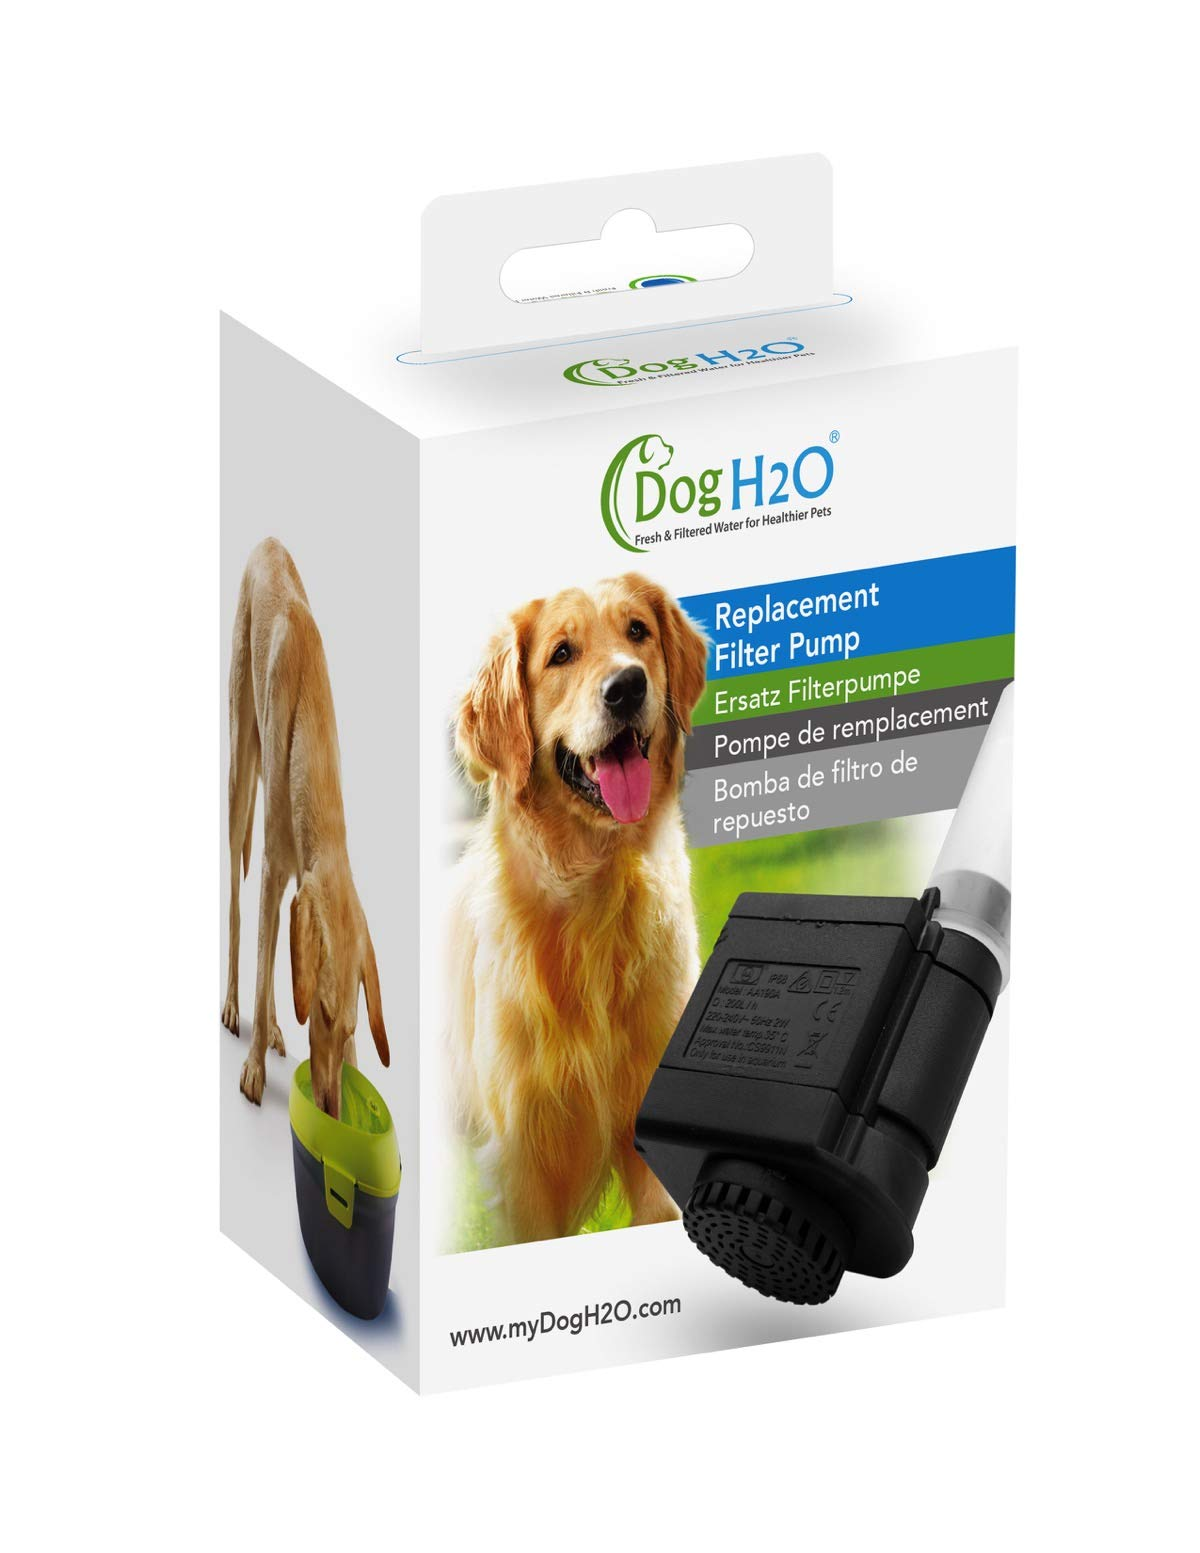 Dog H2O CHD190 Replacement Filter Pump, Black